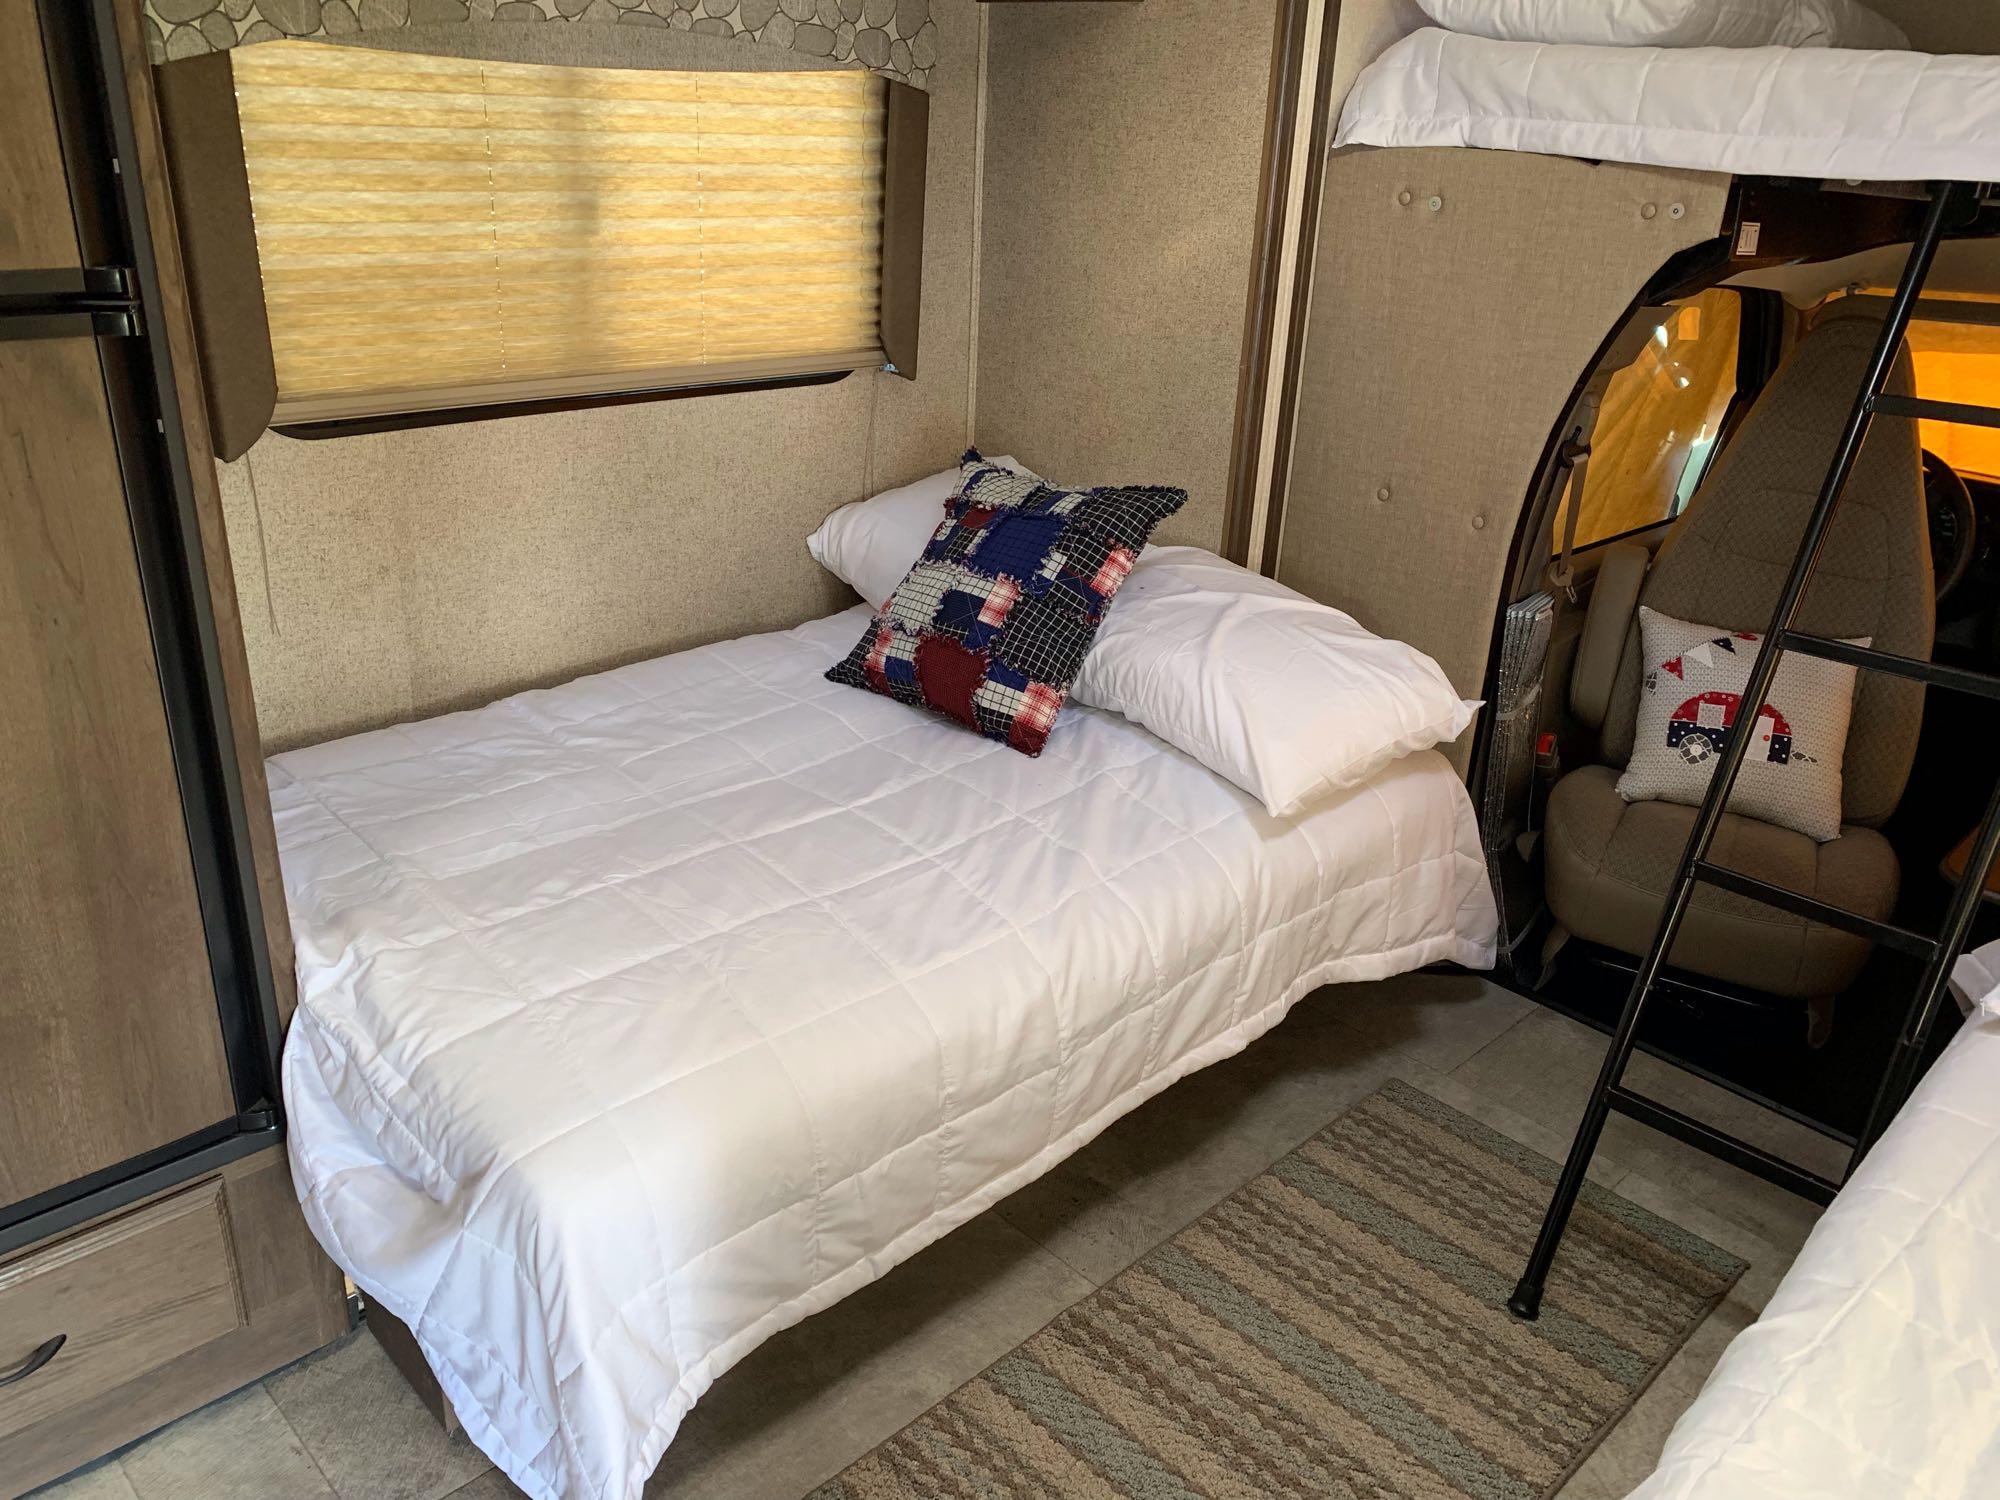 sofa makes into a bed that fits 2. Coachmen Freelander 2019